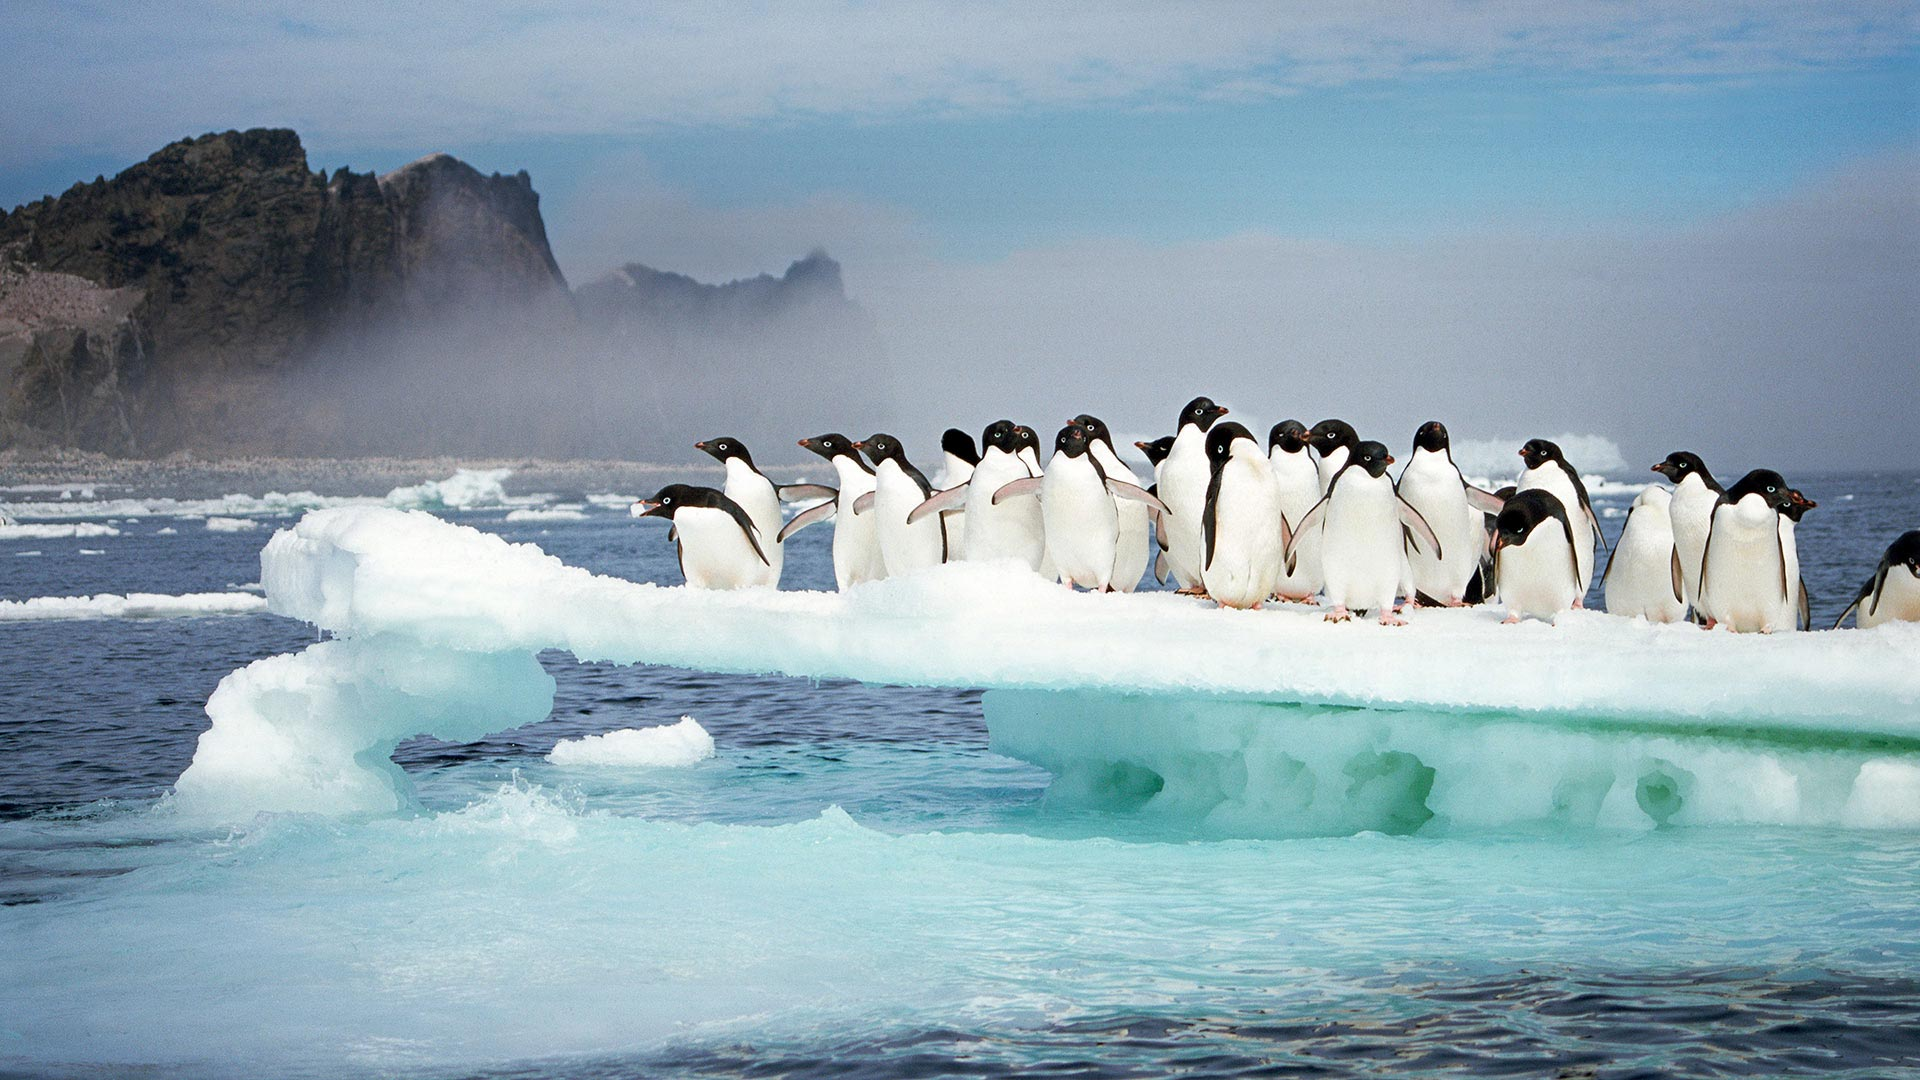 Adélie penguins at Possession Island, Antarctica